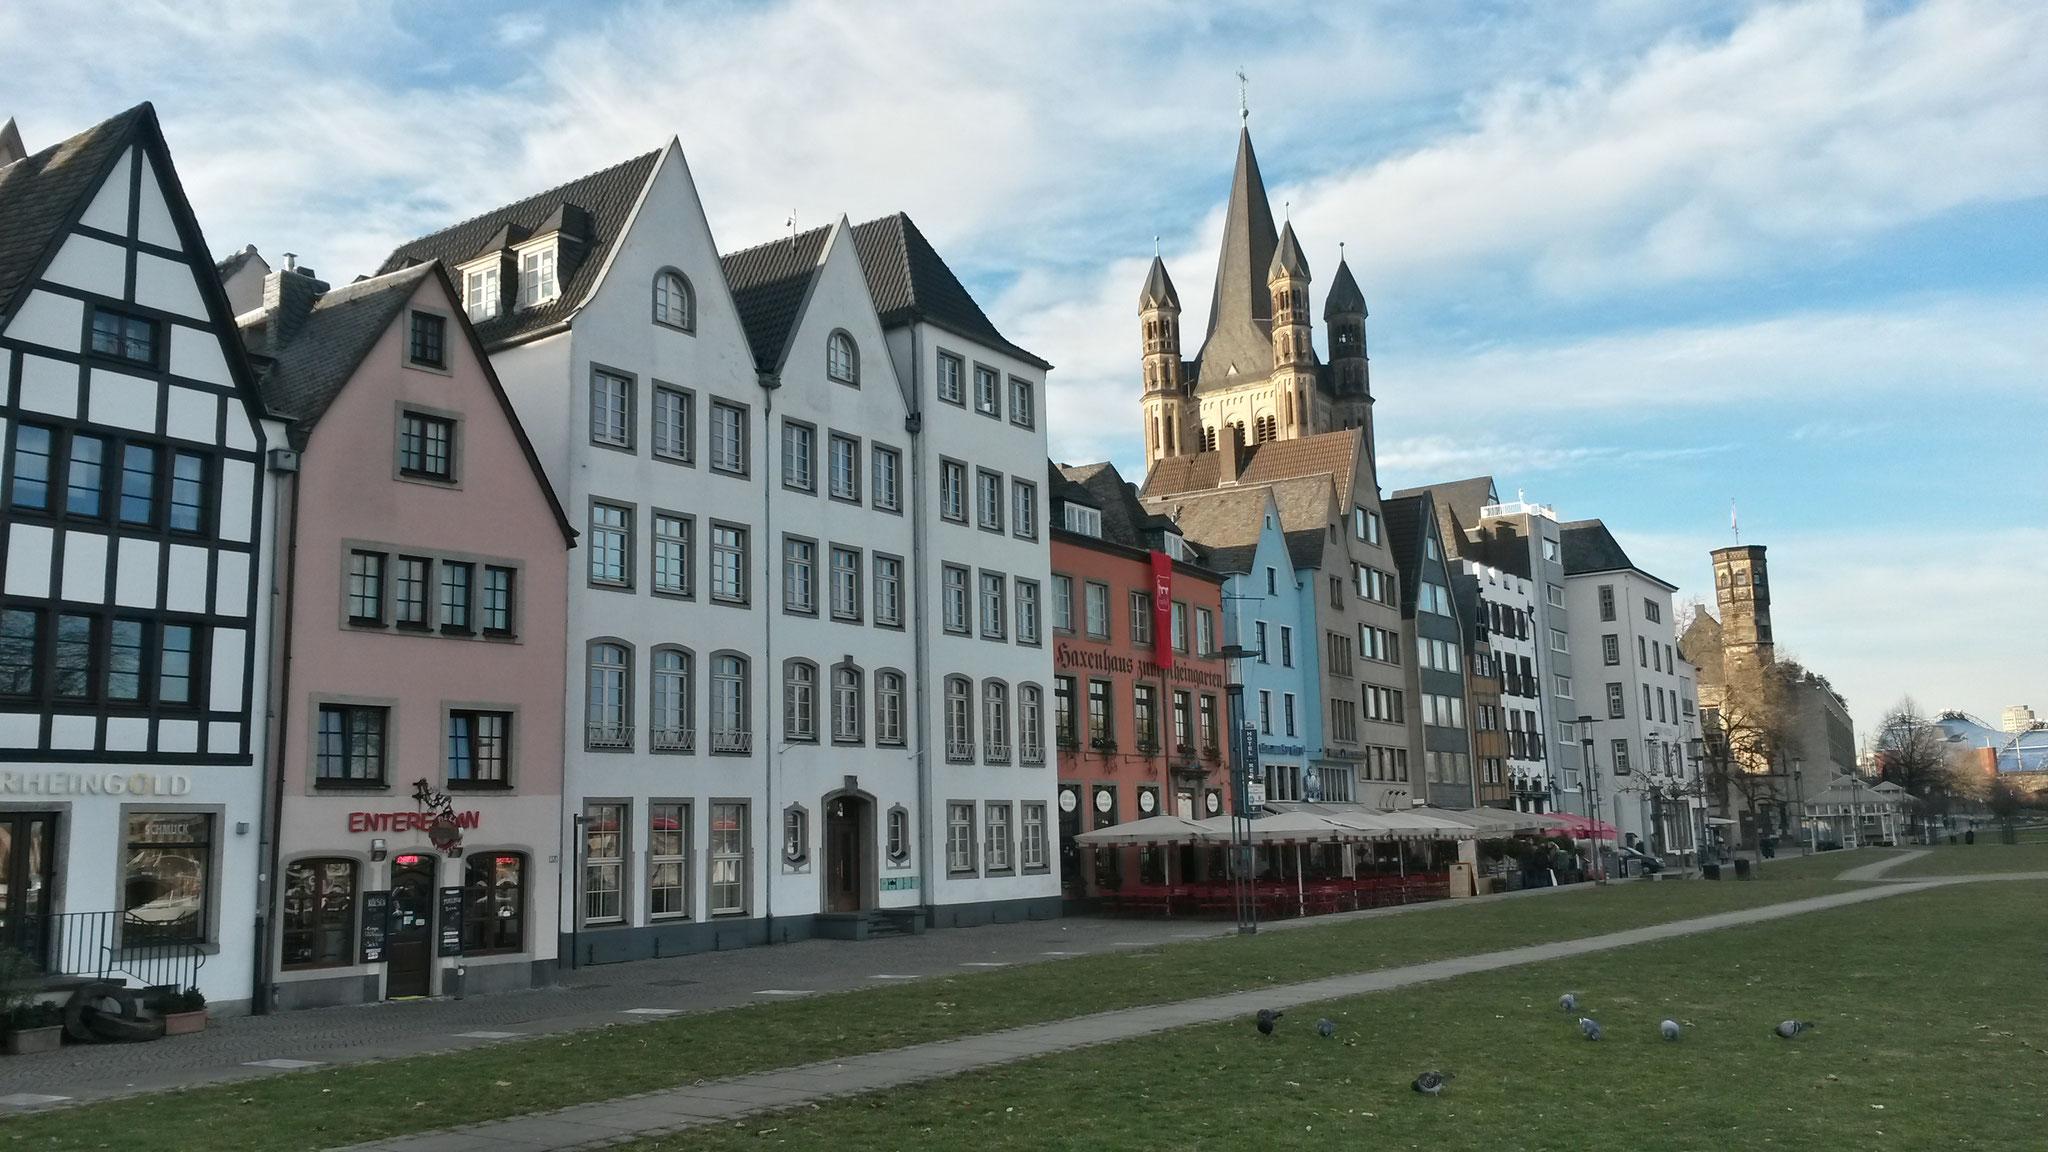 Altstadtblick von der Rheinpromenade